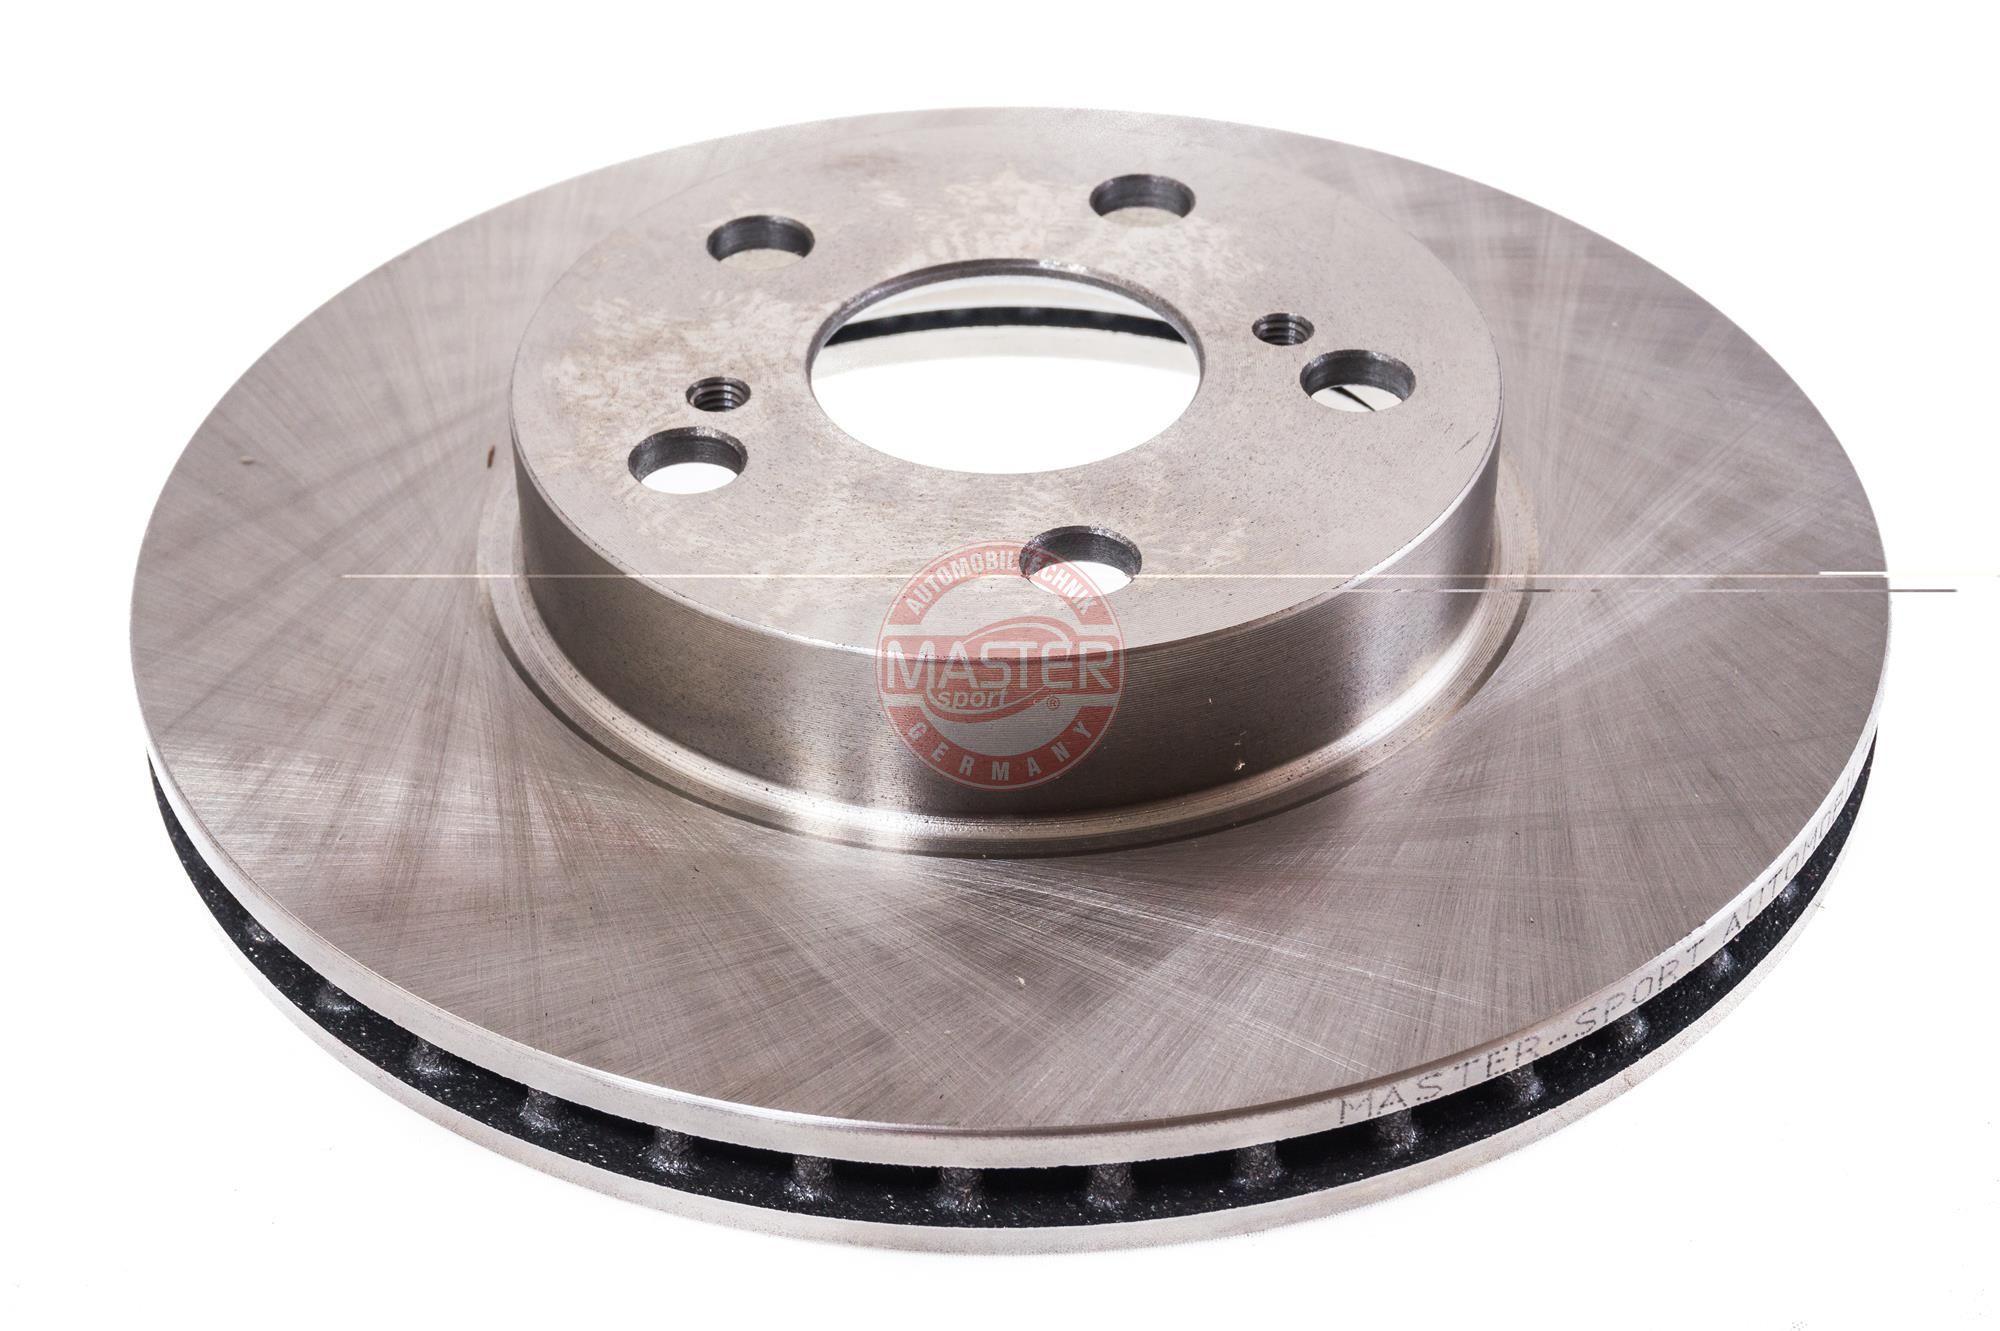 Bremsscheiben MASTER-SPORT 24012202581-PCS-MS